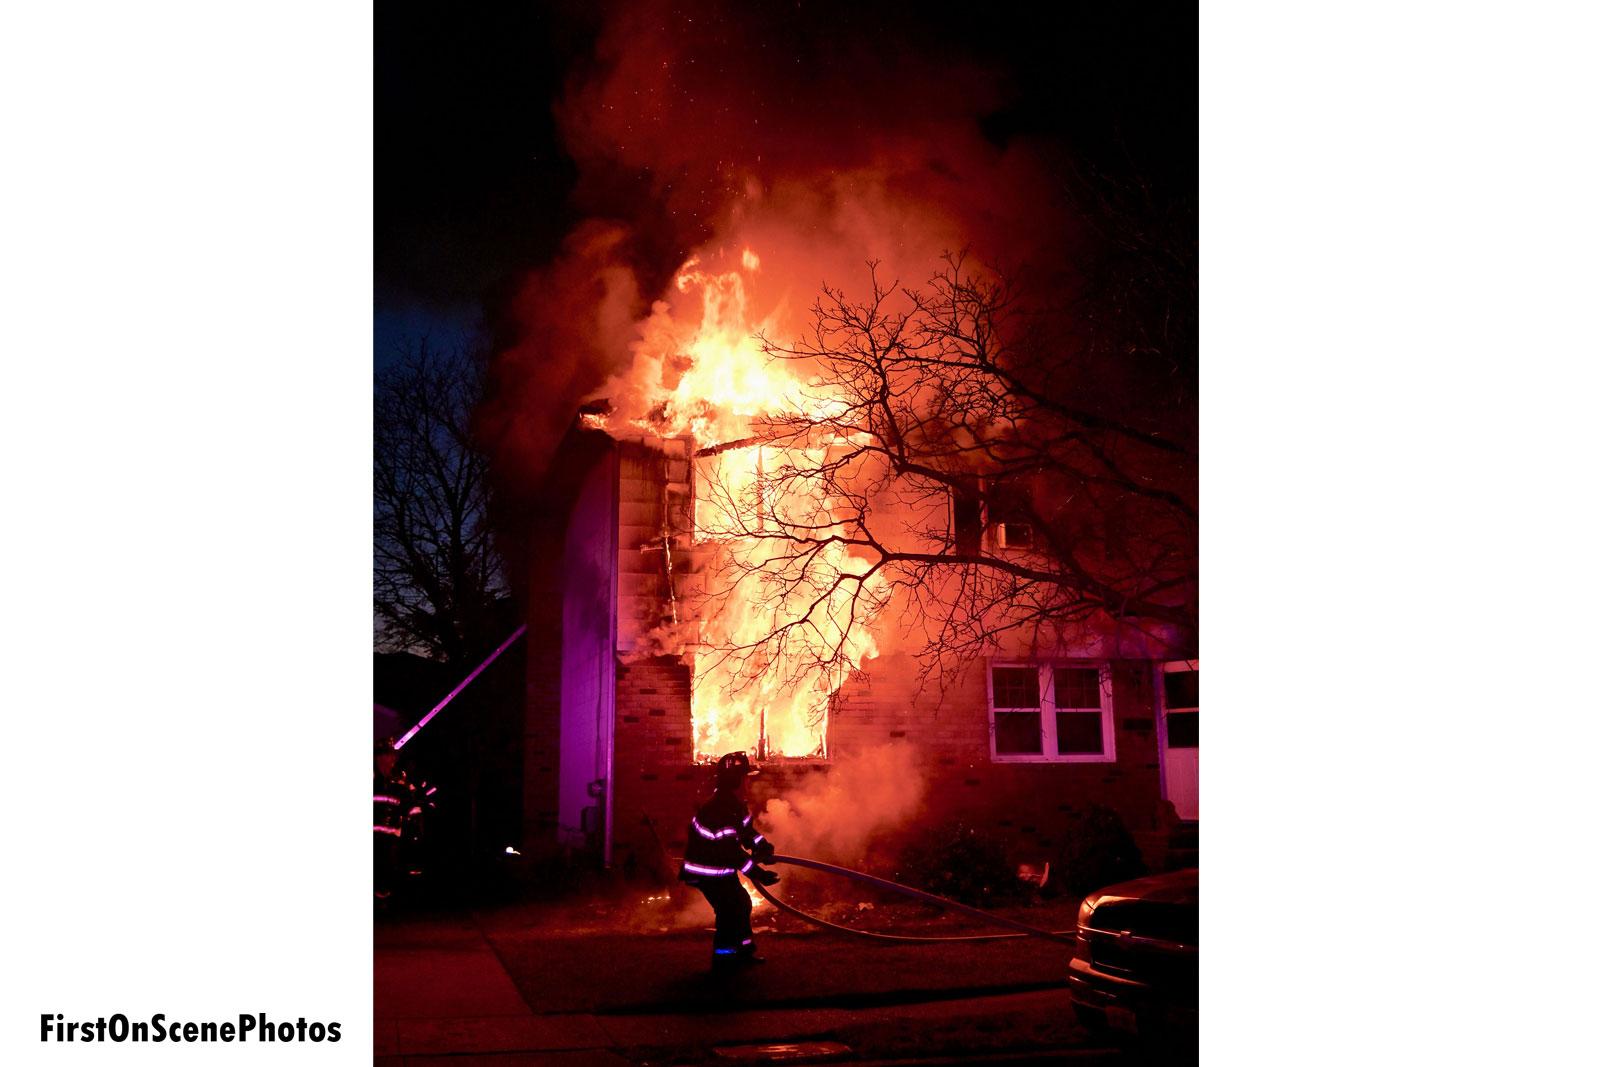 Fire tears through the building